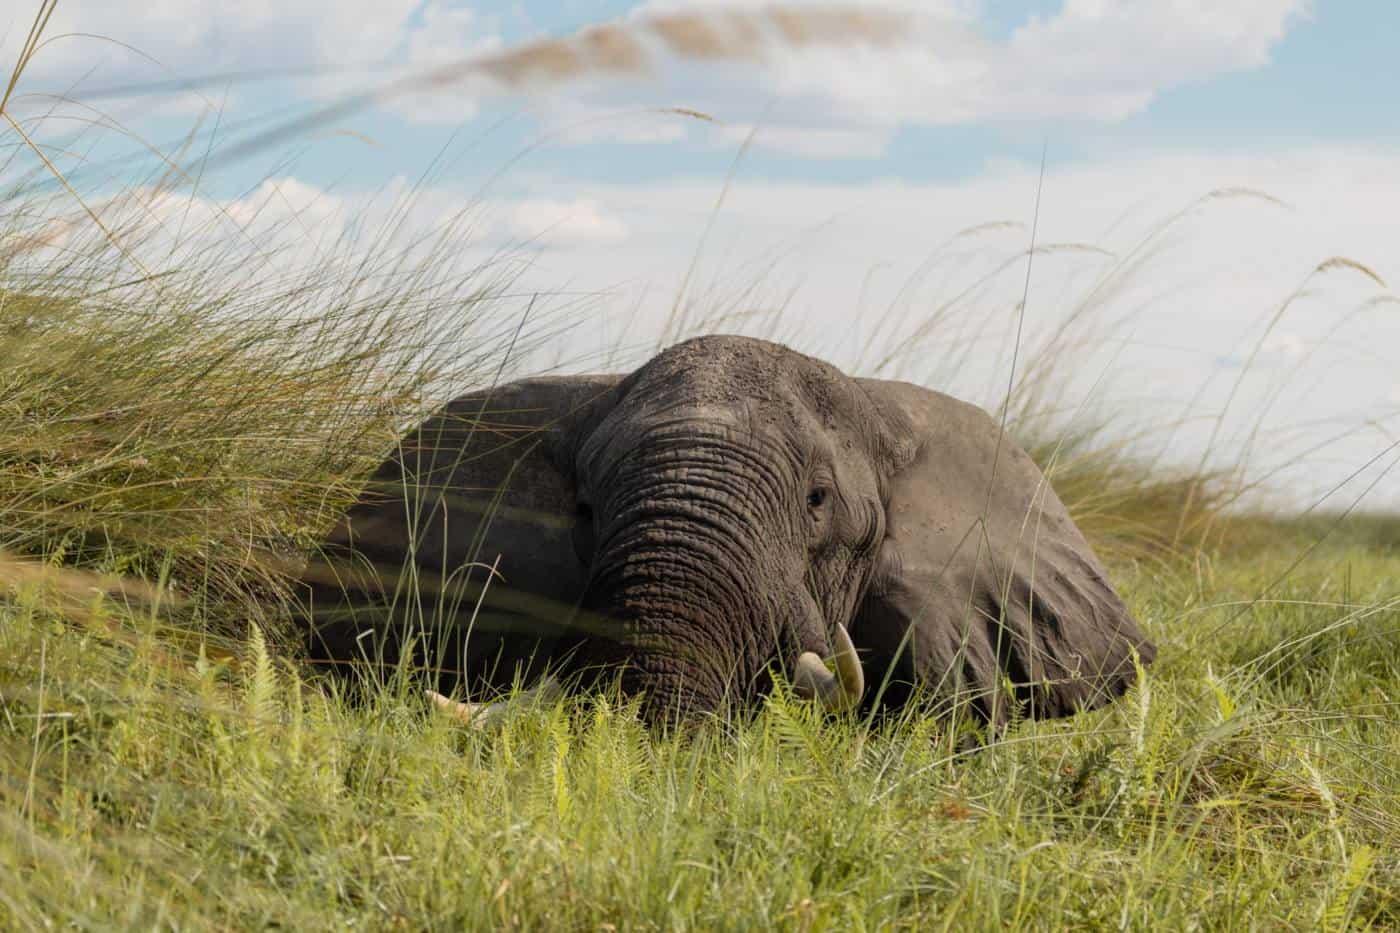 Okavango Delta on a budget safari elephant